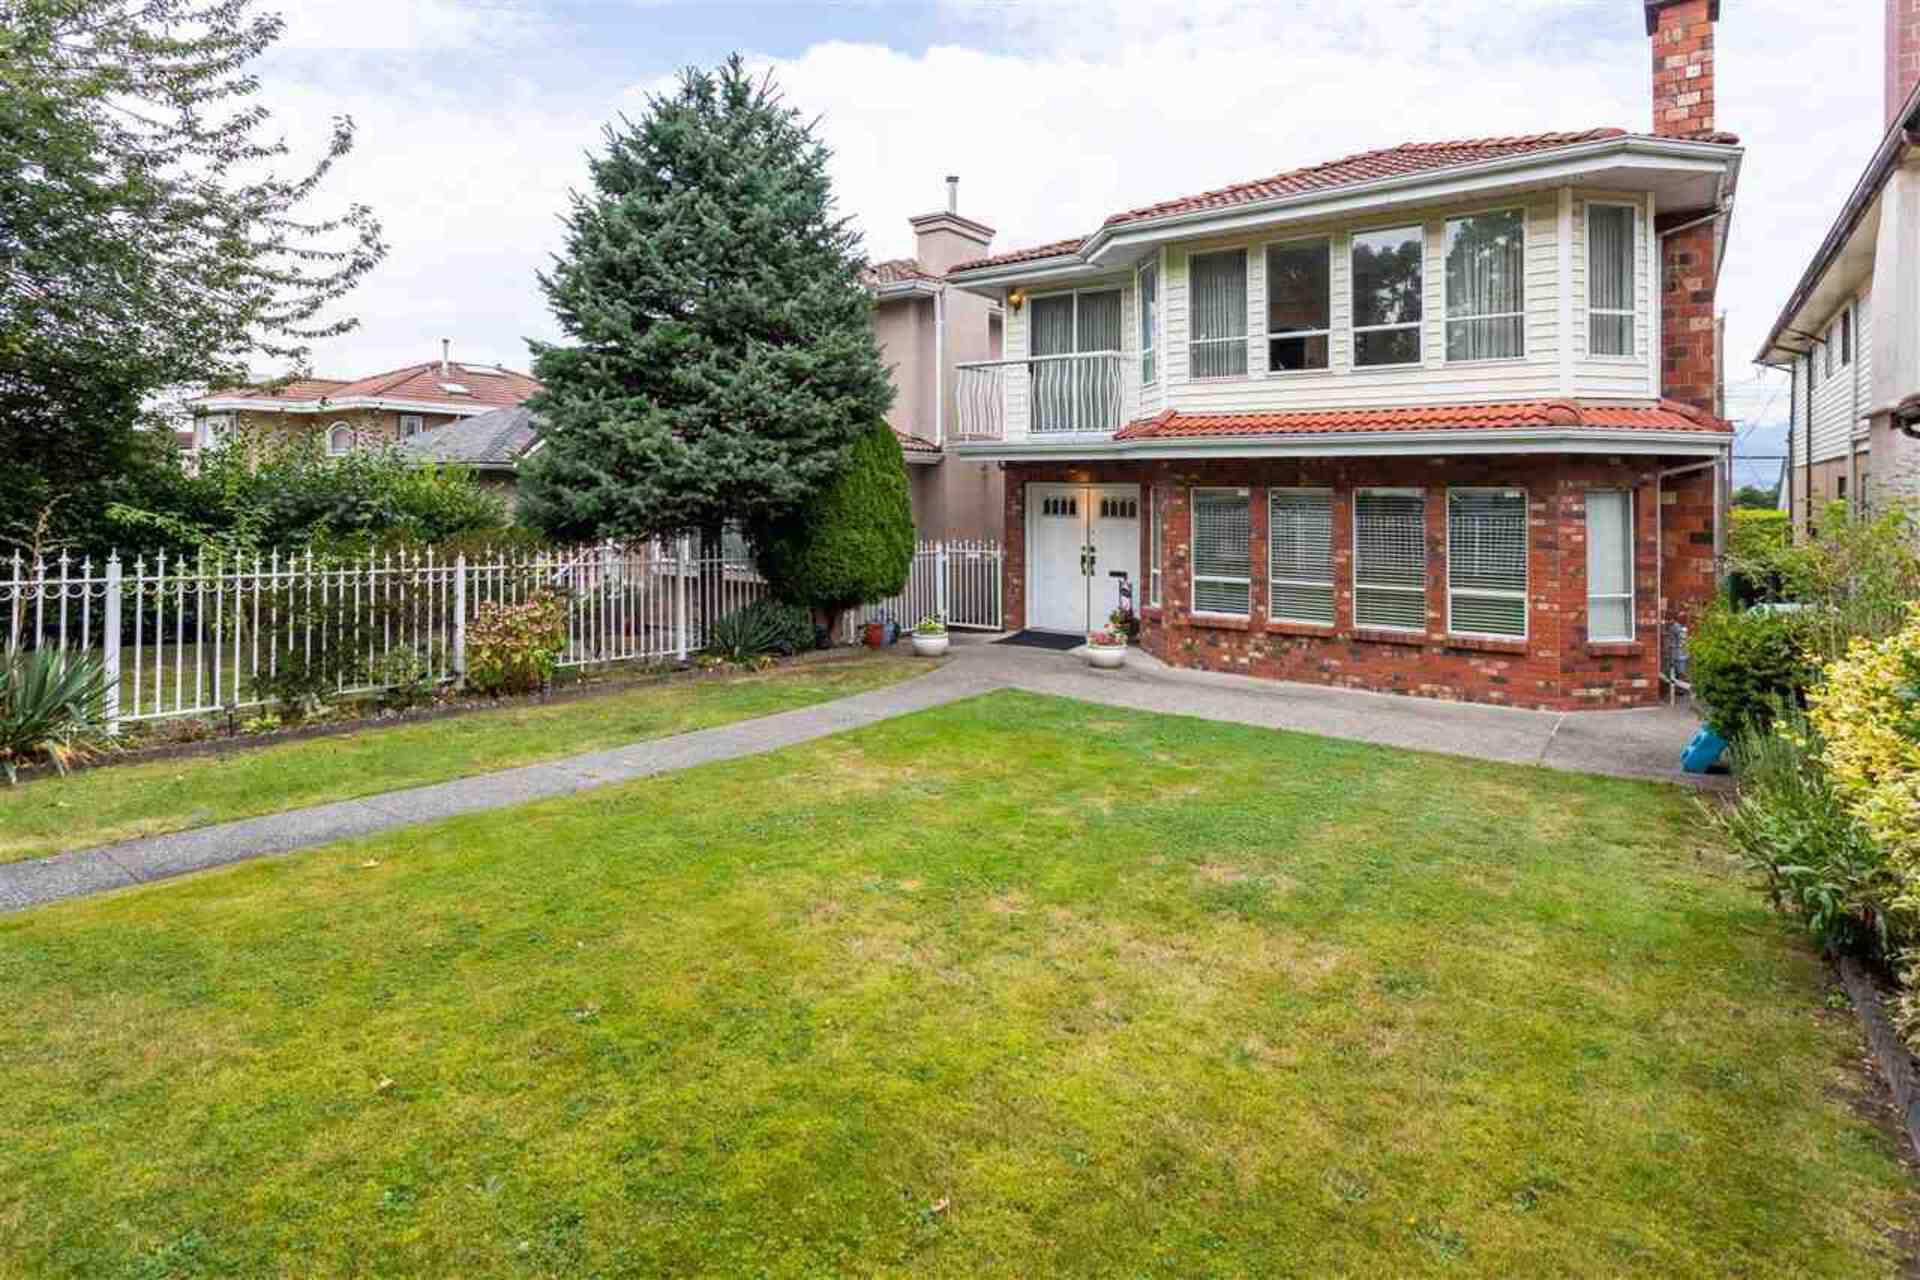 2675-e-5th-avenue-renfrew-ve-vancouver-east-02 at 2675 E 5th Avenue, Renfrew VE, Vancouver East